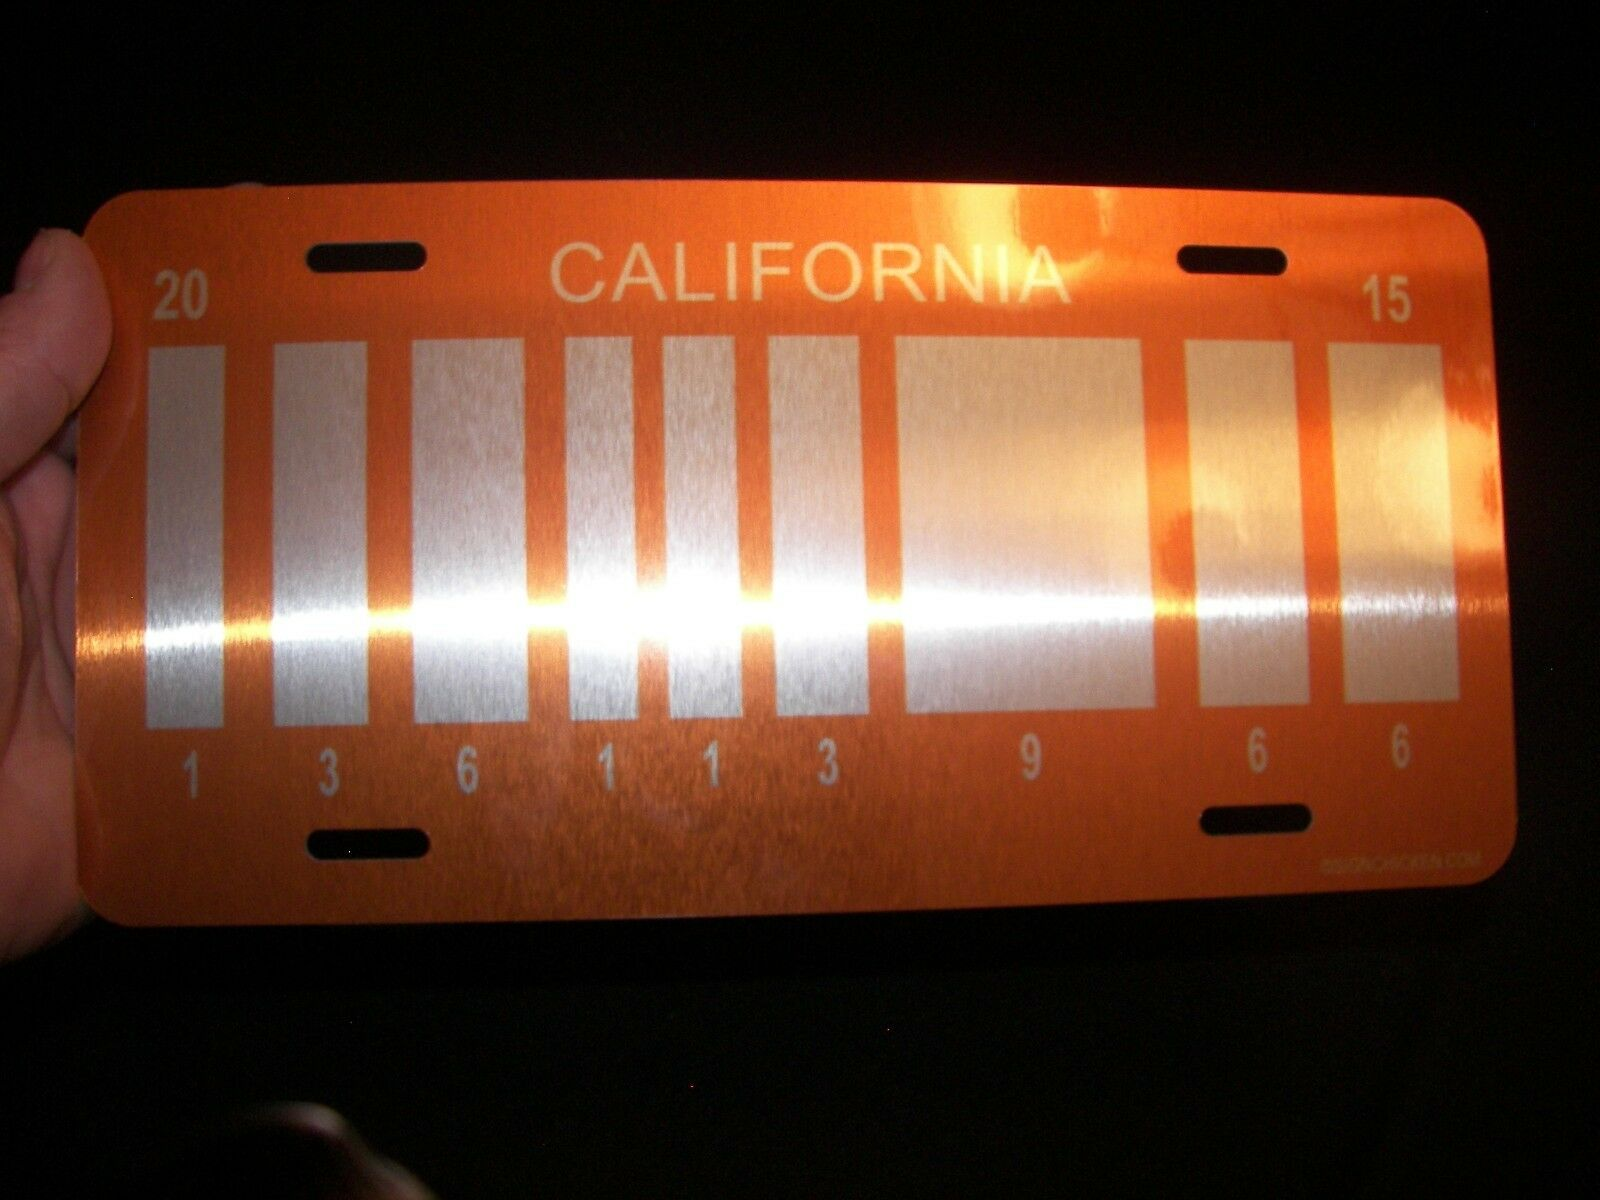 Back to the Future / Delorean / OUTATIME LICENSE PLATE ULTIMATE COLLECTORS SET